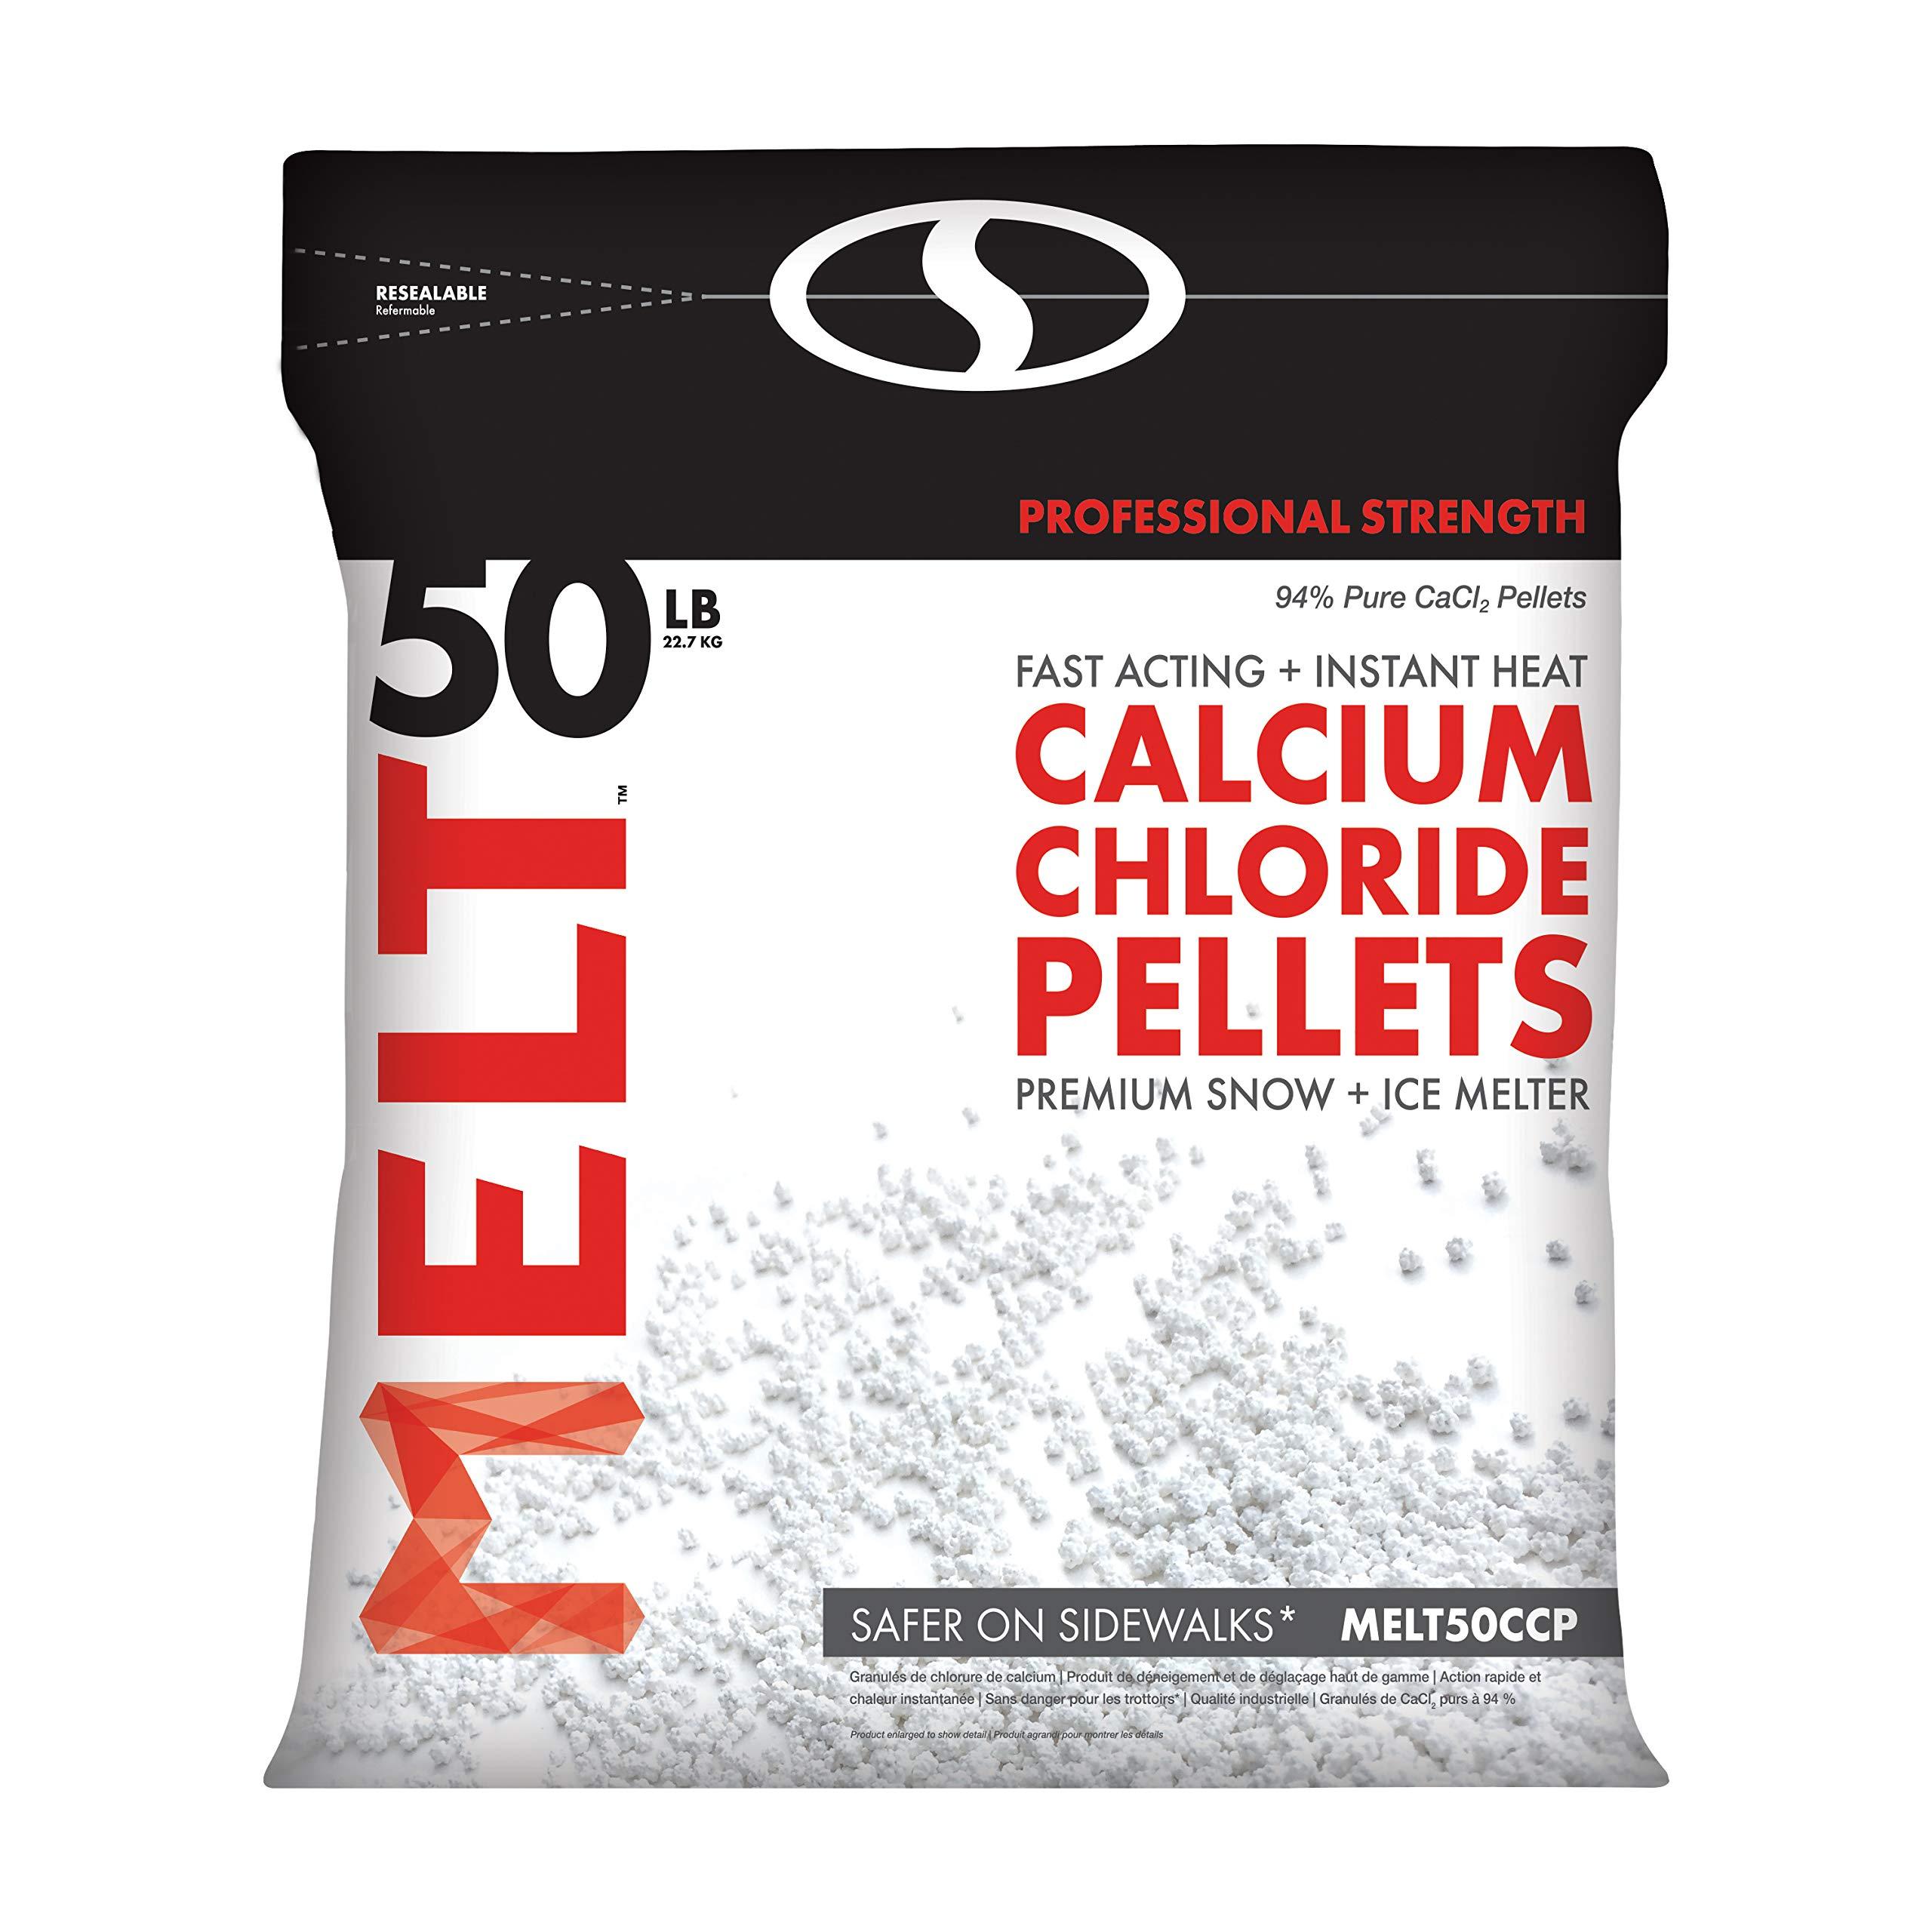 Snow Joe MELT50CCP 50-LB Professional Strength Calcium Chloride Pellets Ice Melter Resealable Bag by Snow Joe